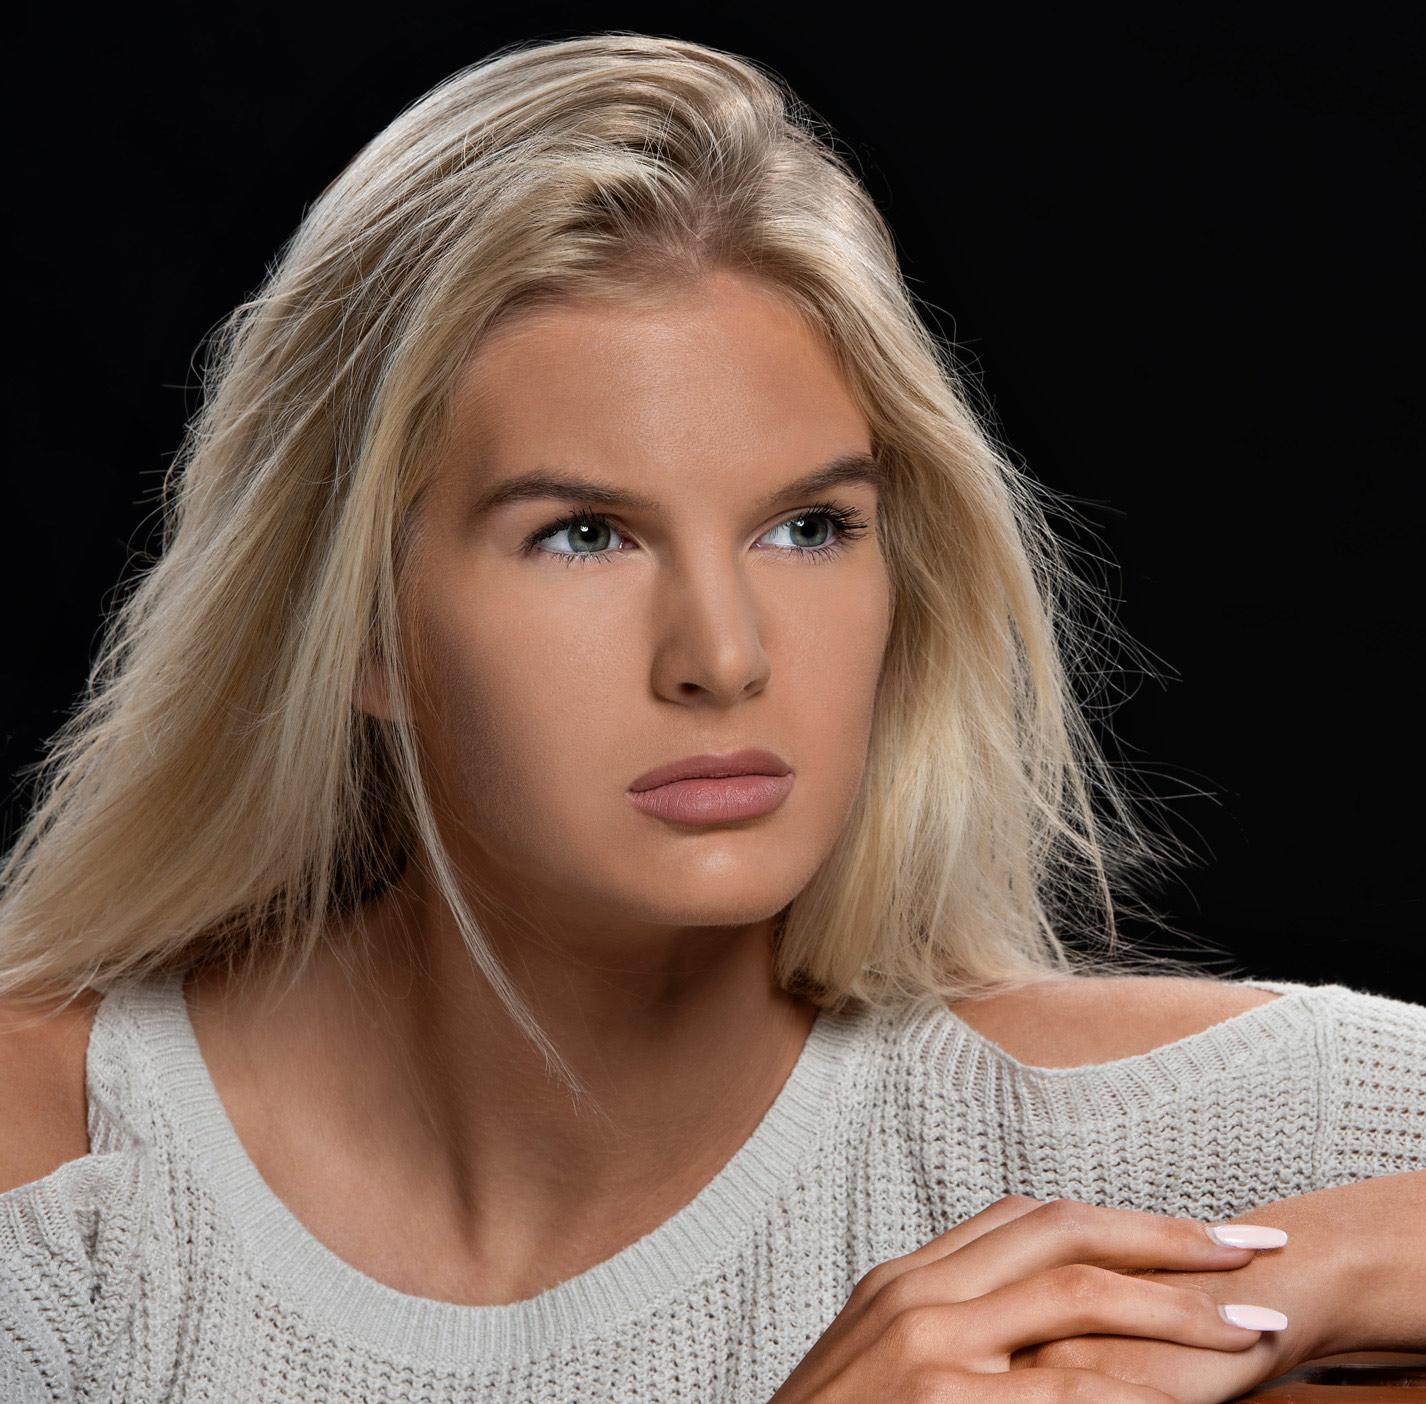 headshot of model for talent agency